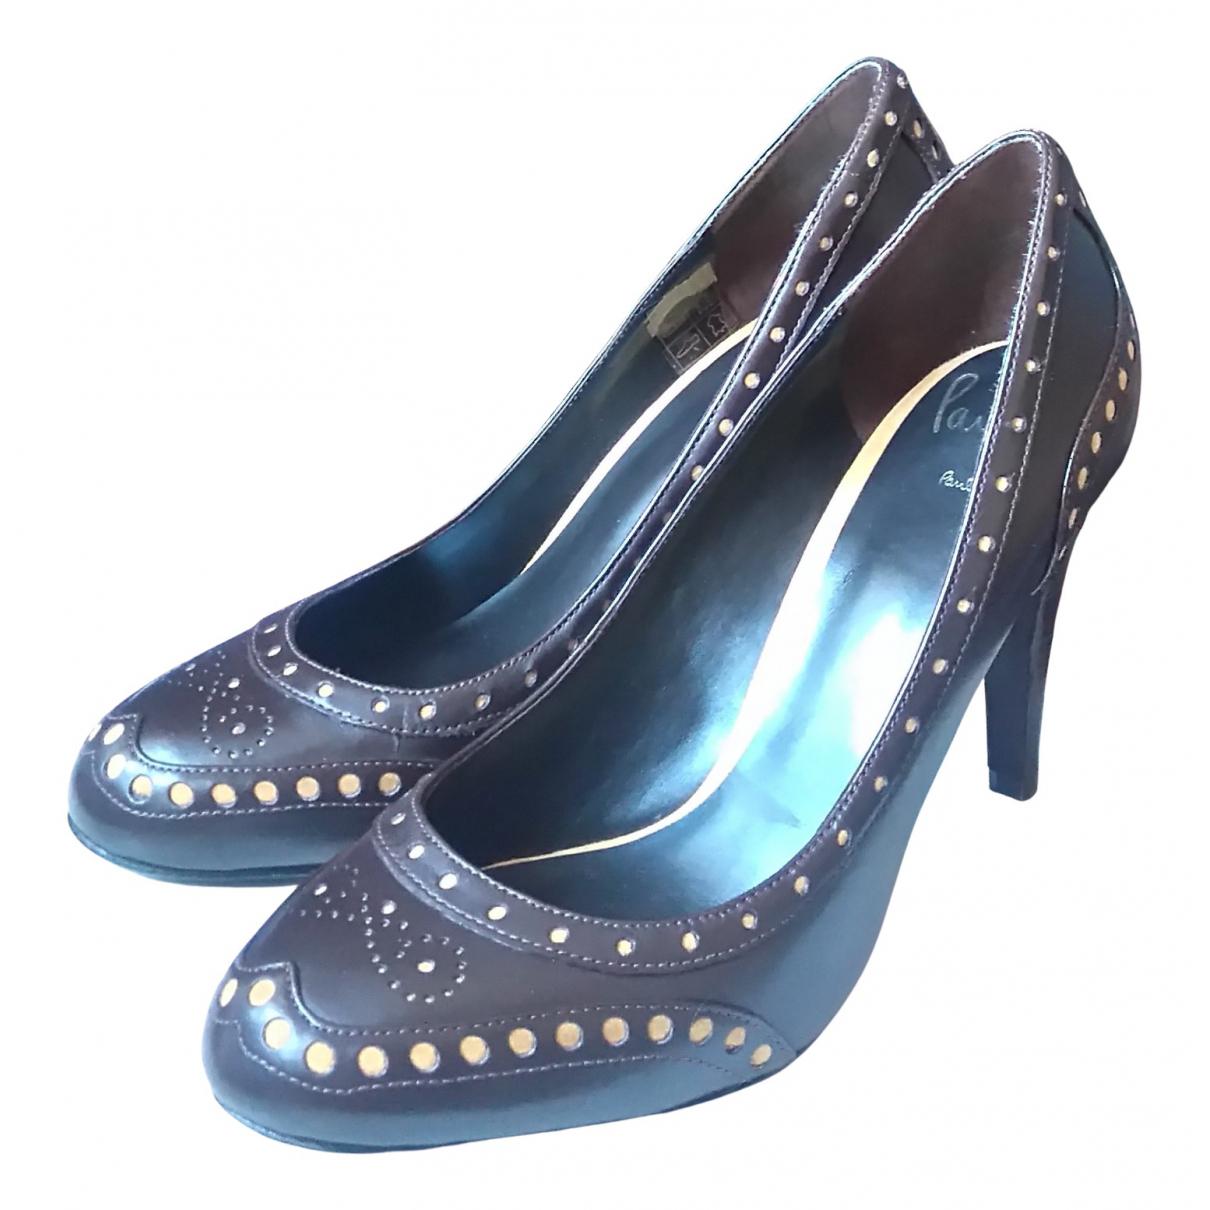 Paul Smith N Brown Leather Heels for Women 39.5 EU